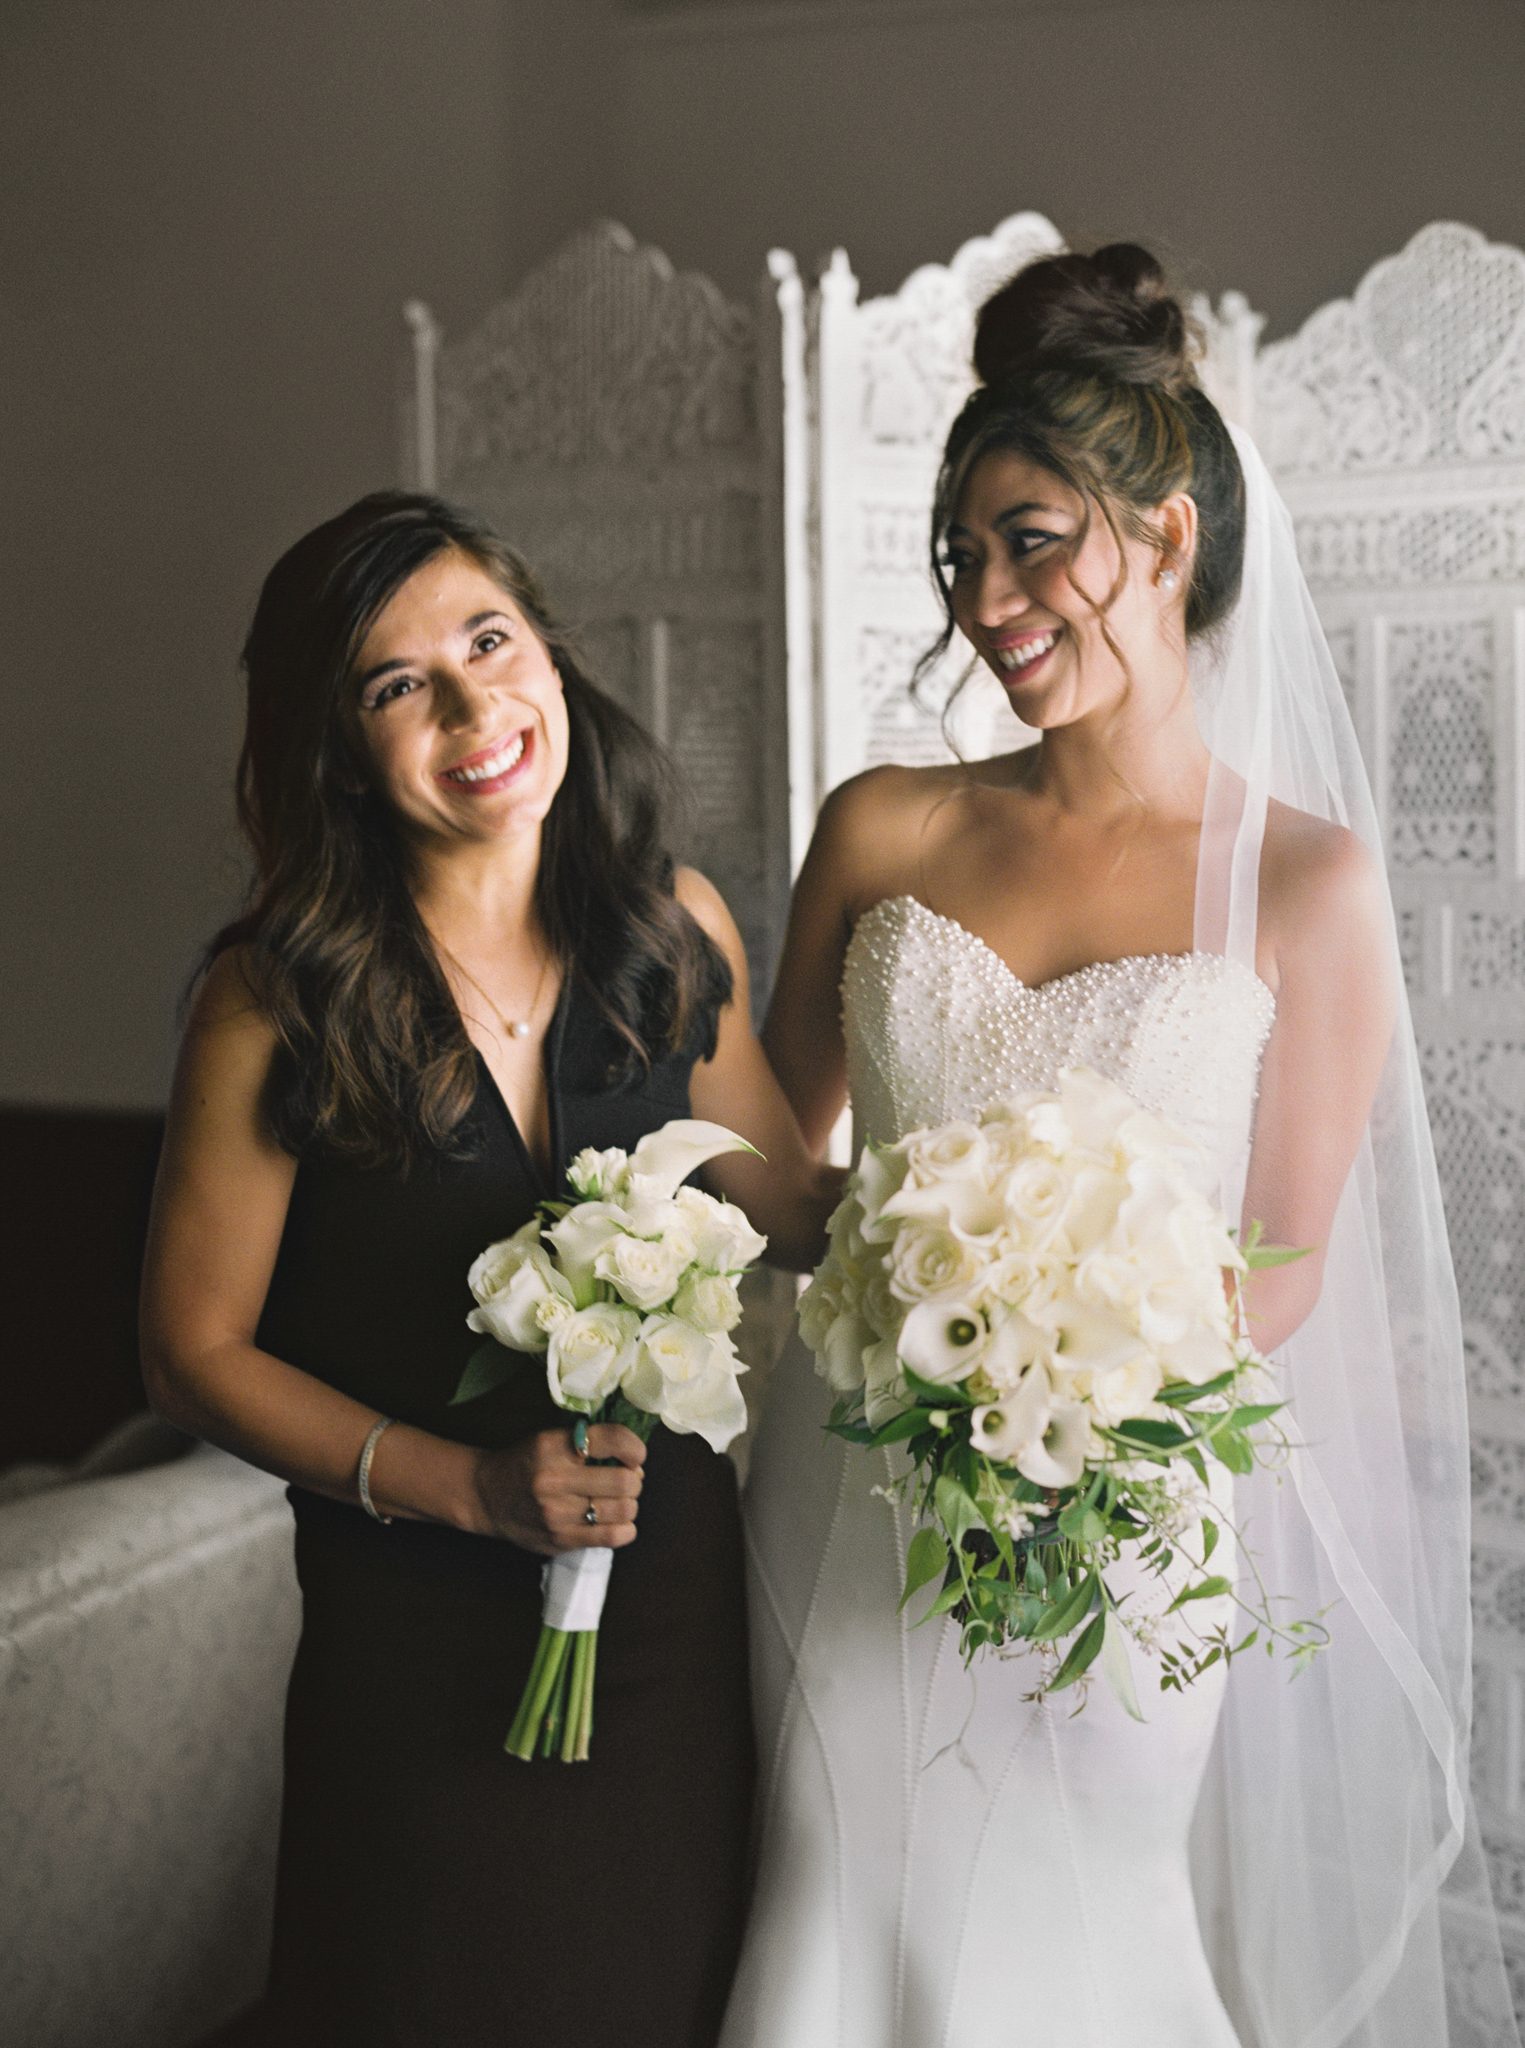 033OutliveCreative_Travel_Photographer_Videographer_Lewis&Clark_Oregon_Elegant_BlackTie_Destination_Wedding.jpg